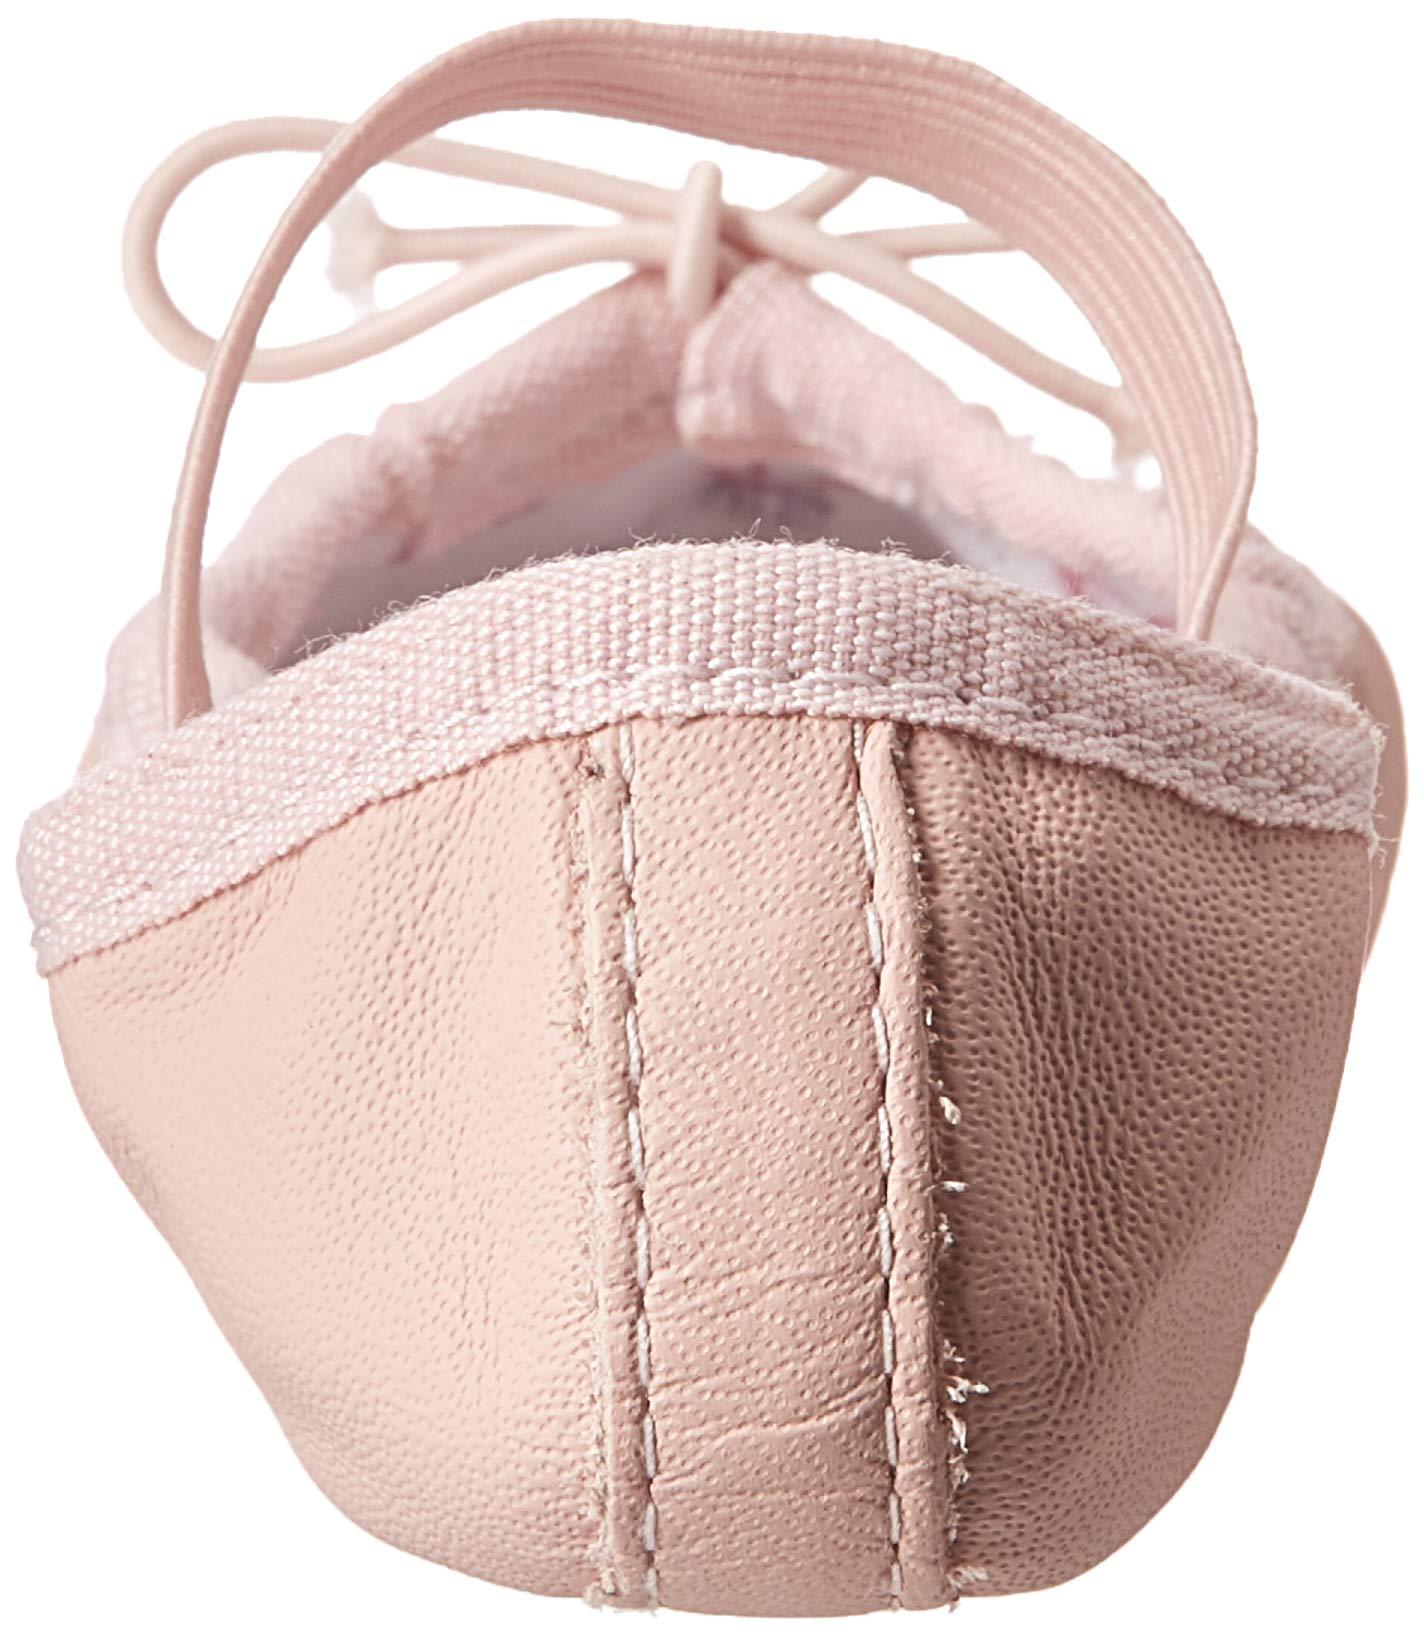 9 C US Little Kid 4-8 Years Toddler//Little Kid Pink Little Kid Bloch Dance Bunnyhop Ballet Slipper